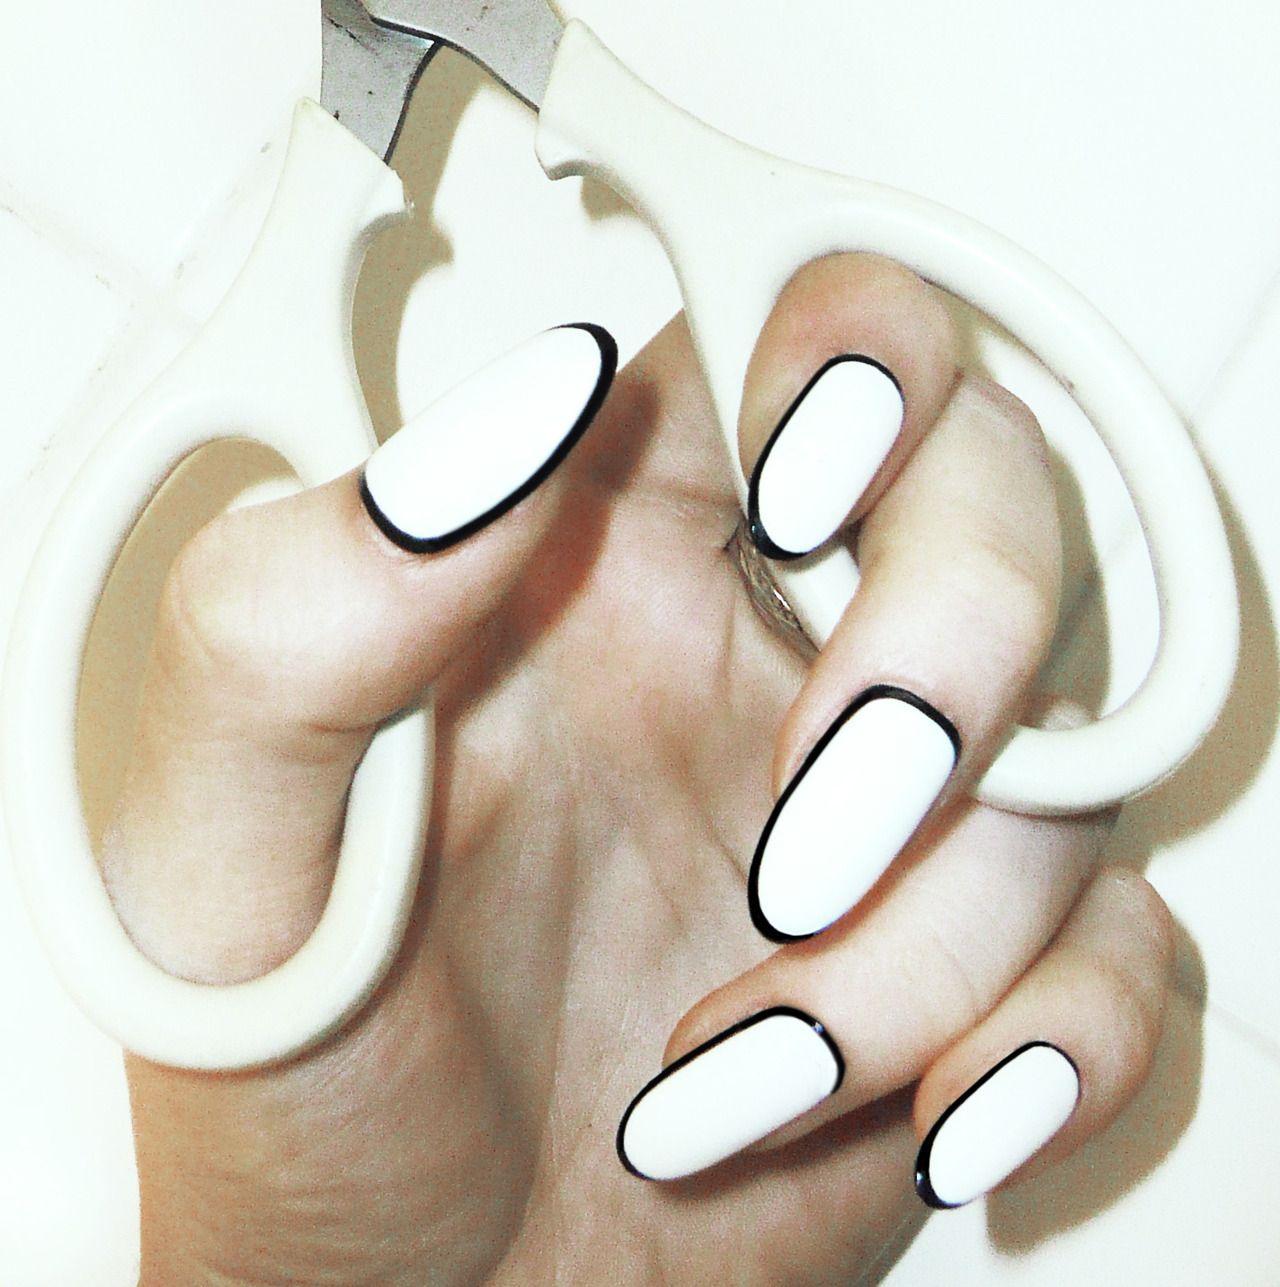 HAUTE!! | Fashion Fix | Pinterest | Black nails, Nail trends and ...